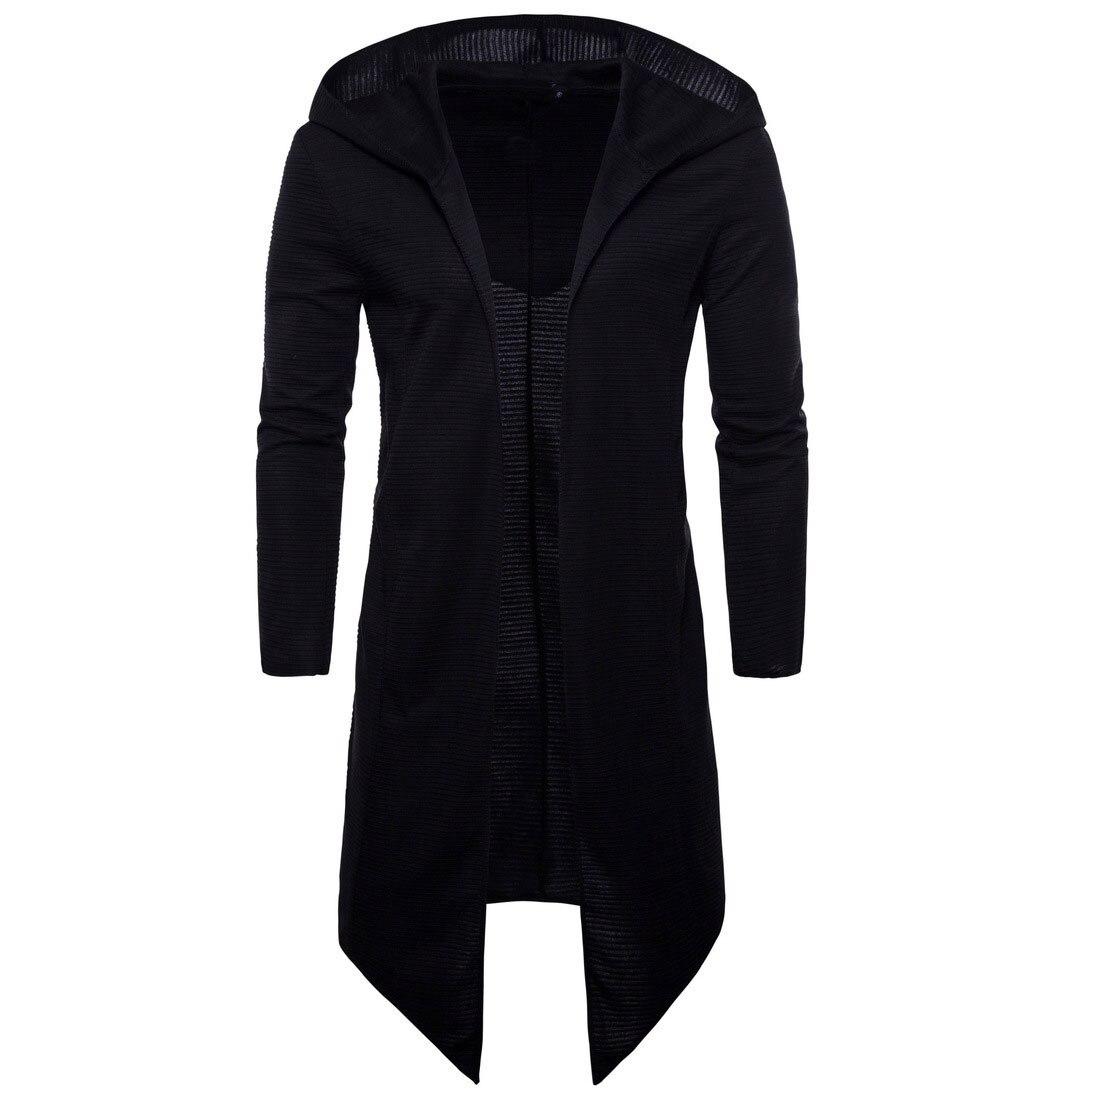 Men Trench Coat Spring Fashion Long Fit Trench Coat Men Overcoat